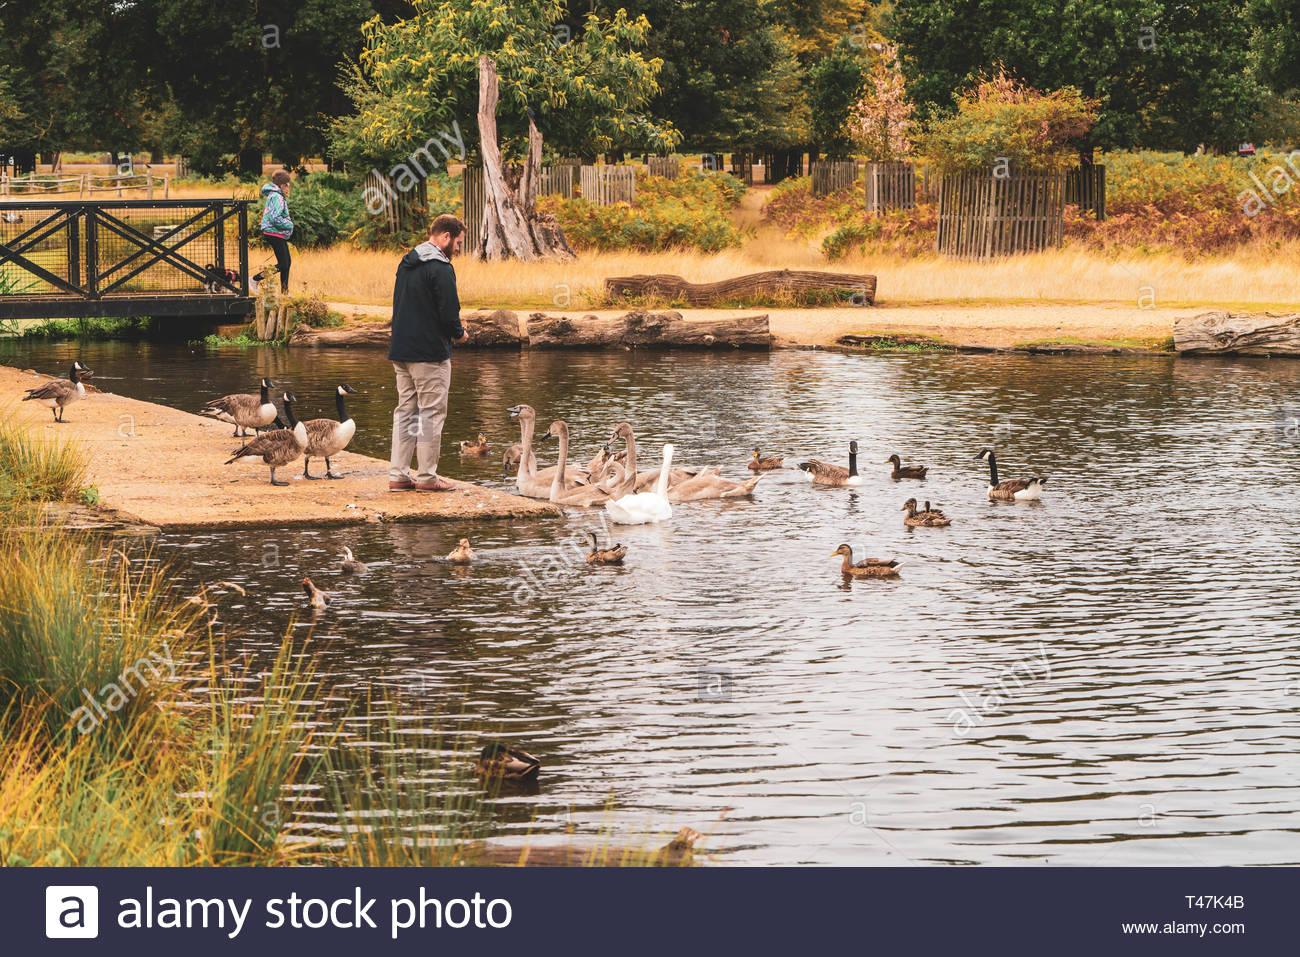 Man feeding birds in bushy park Stock Photo